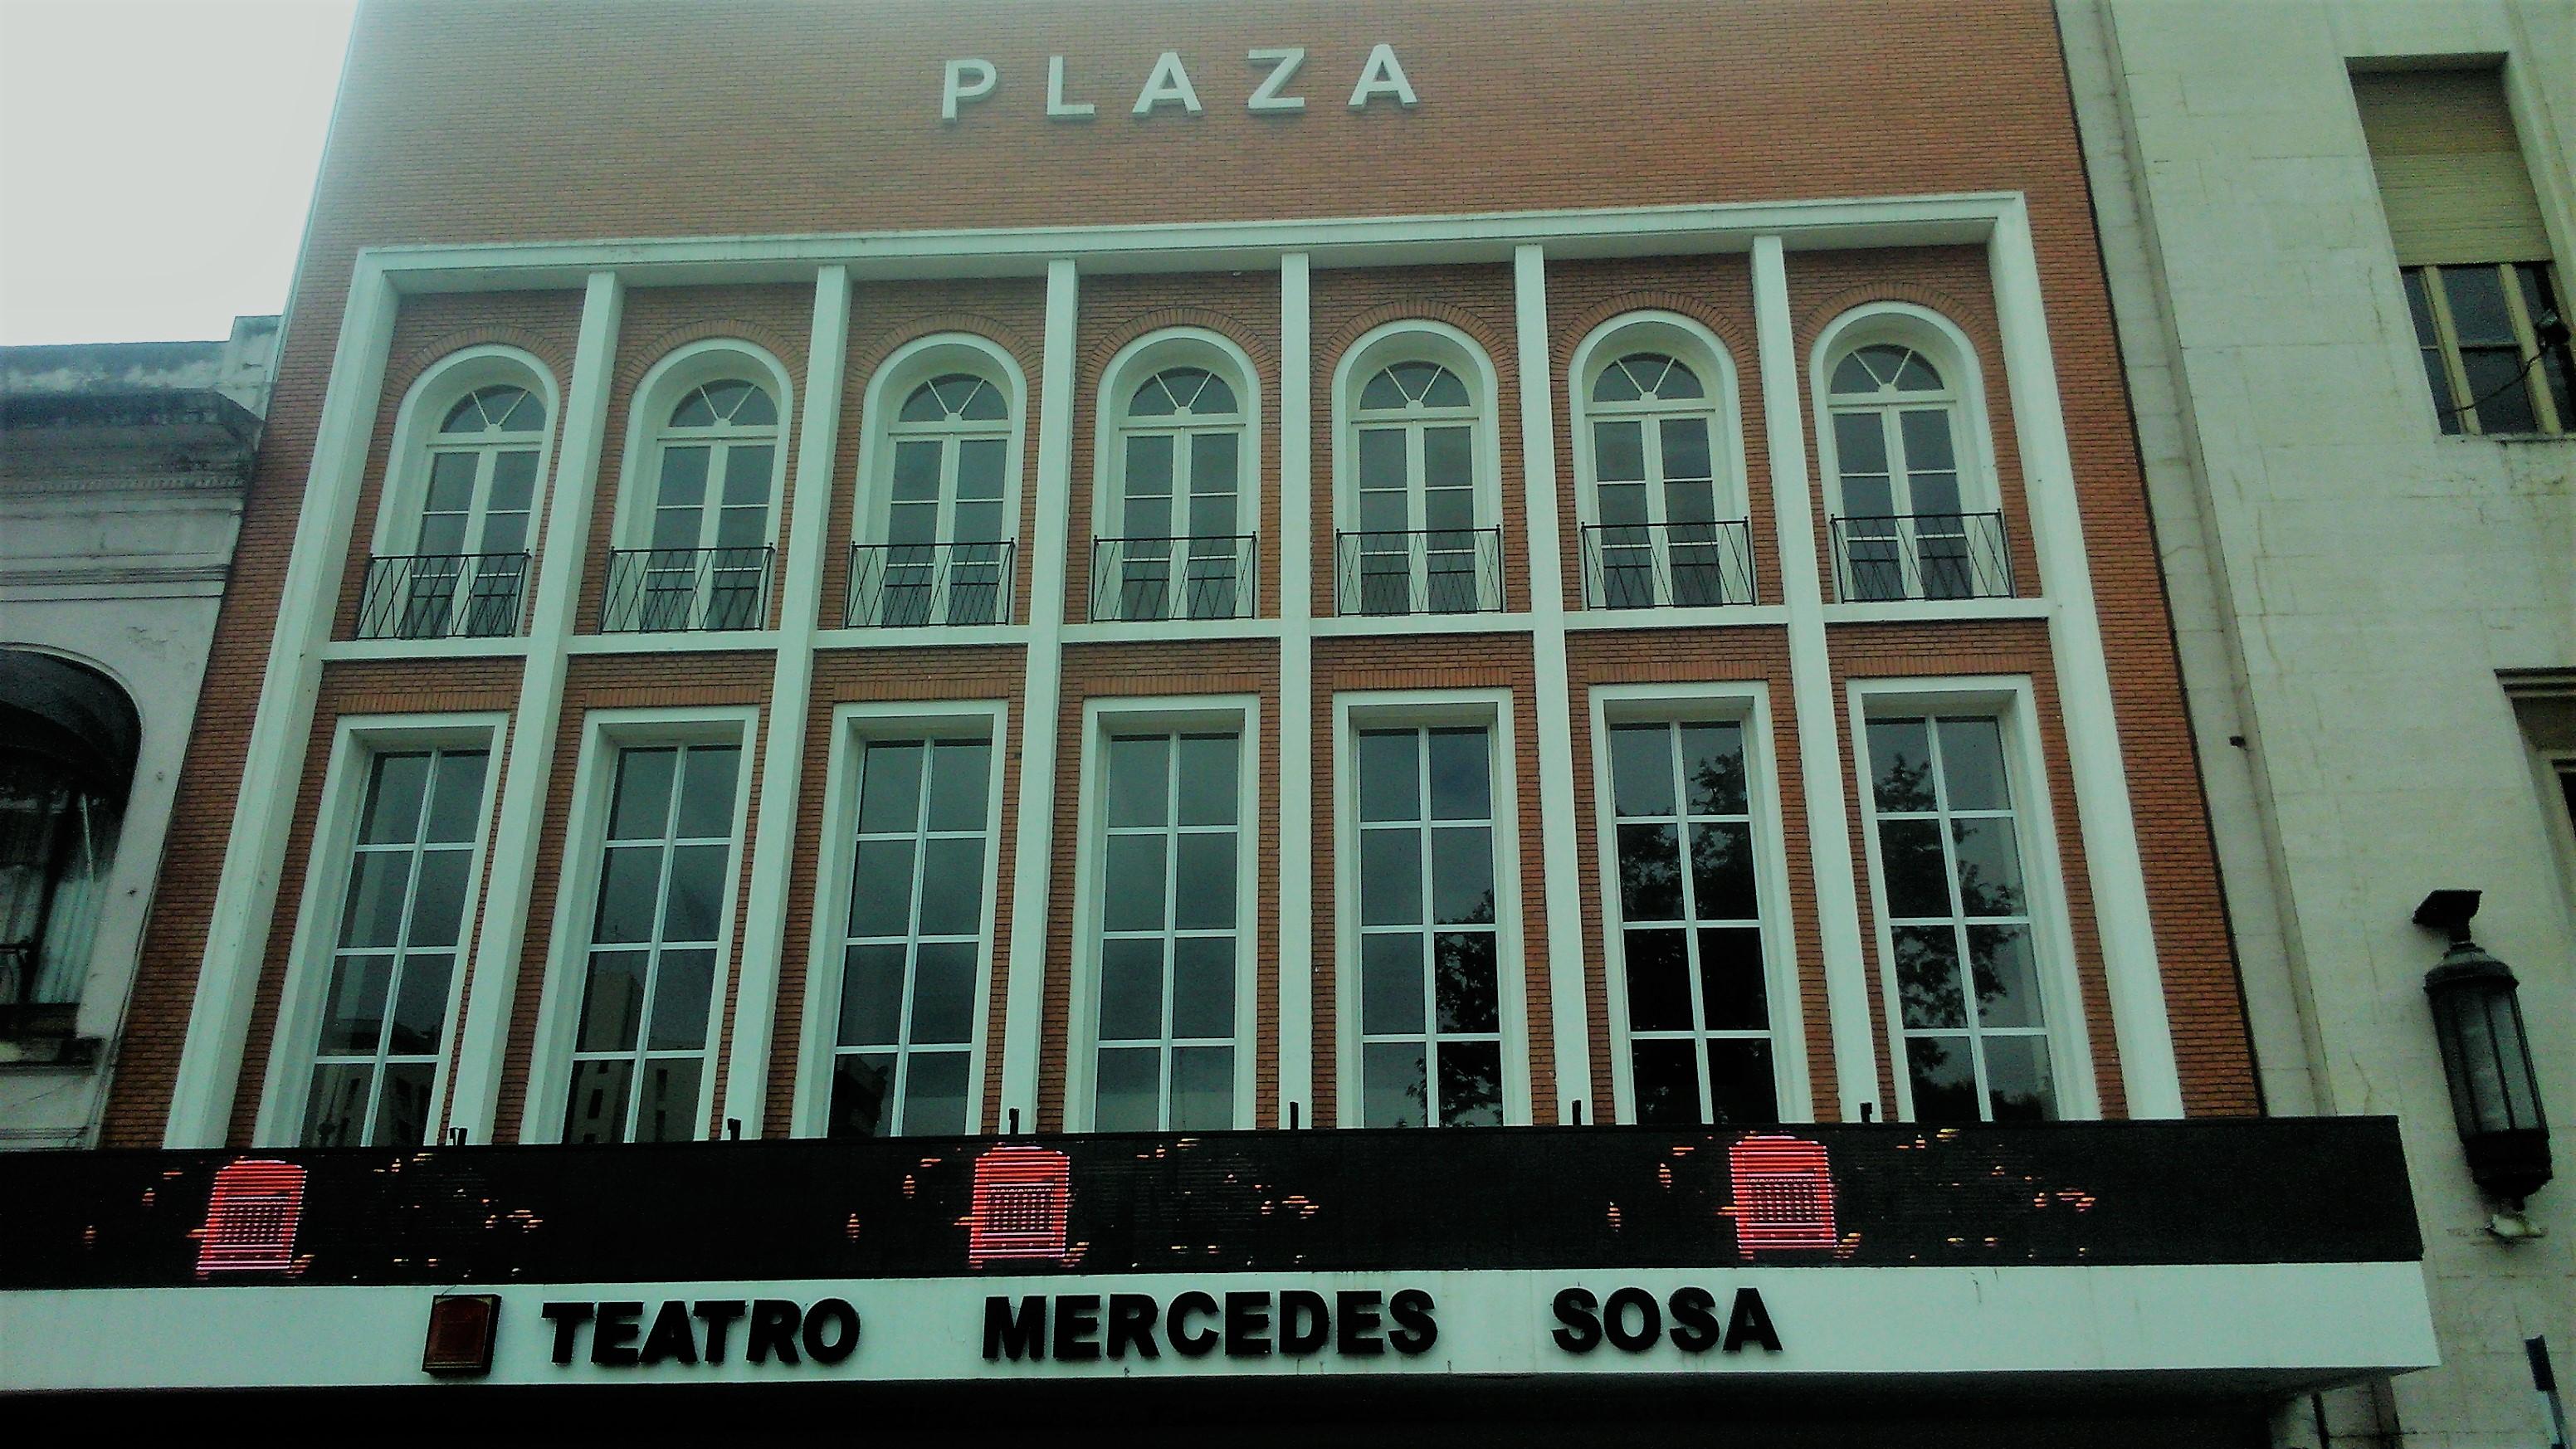 Teatro Mercedes Sosa, frente a la plaza Independencia - Tucuman